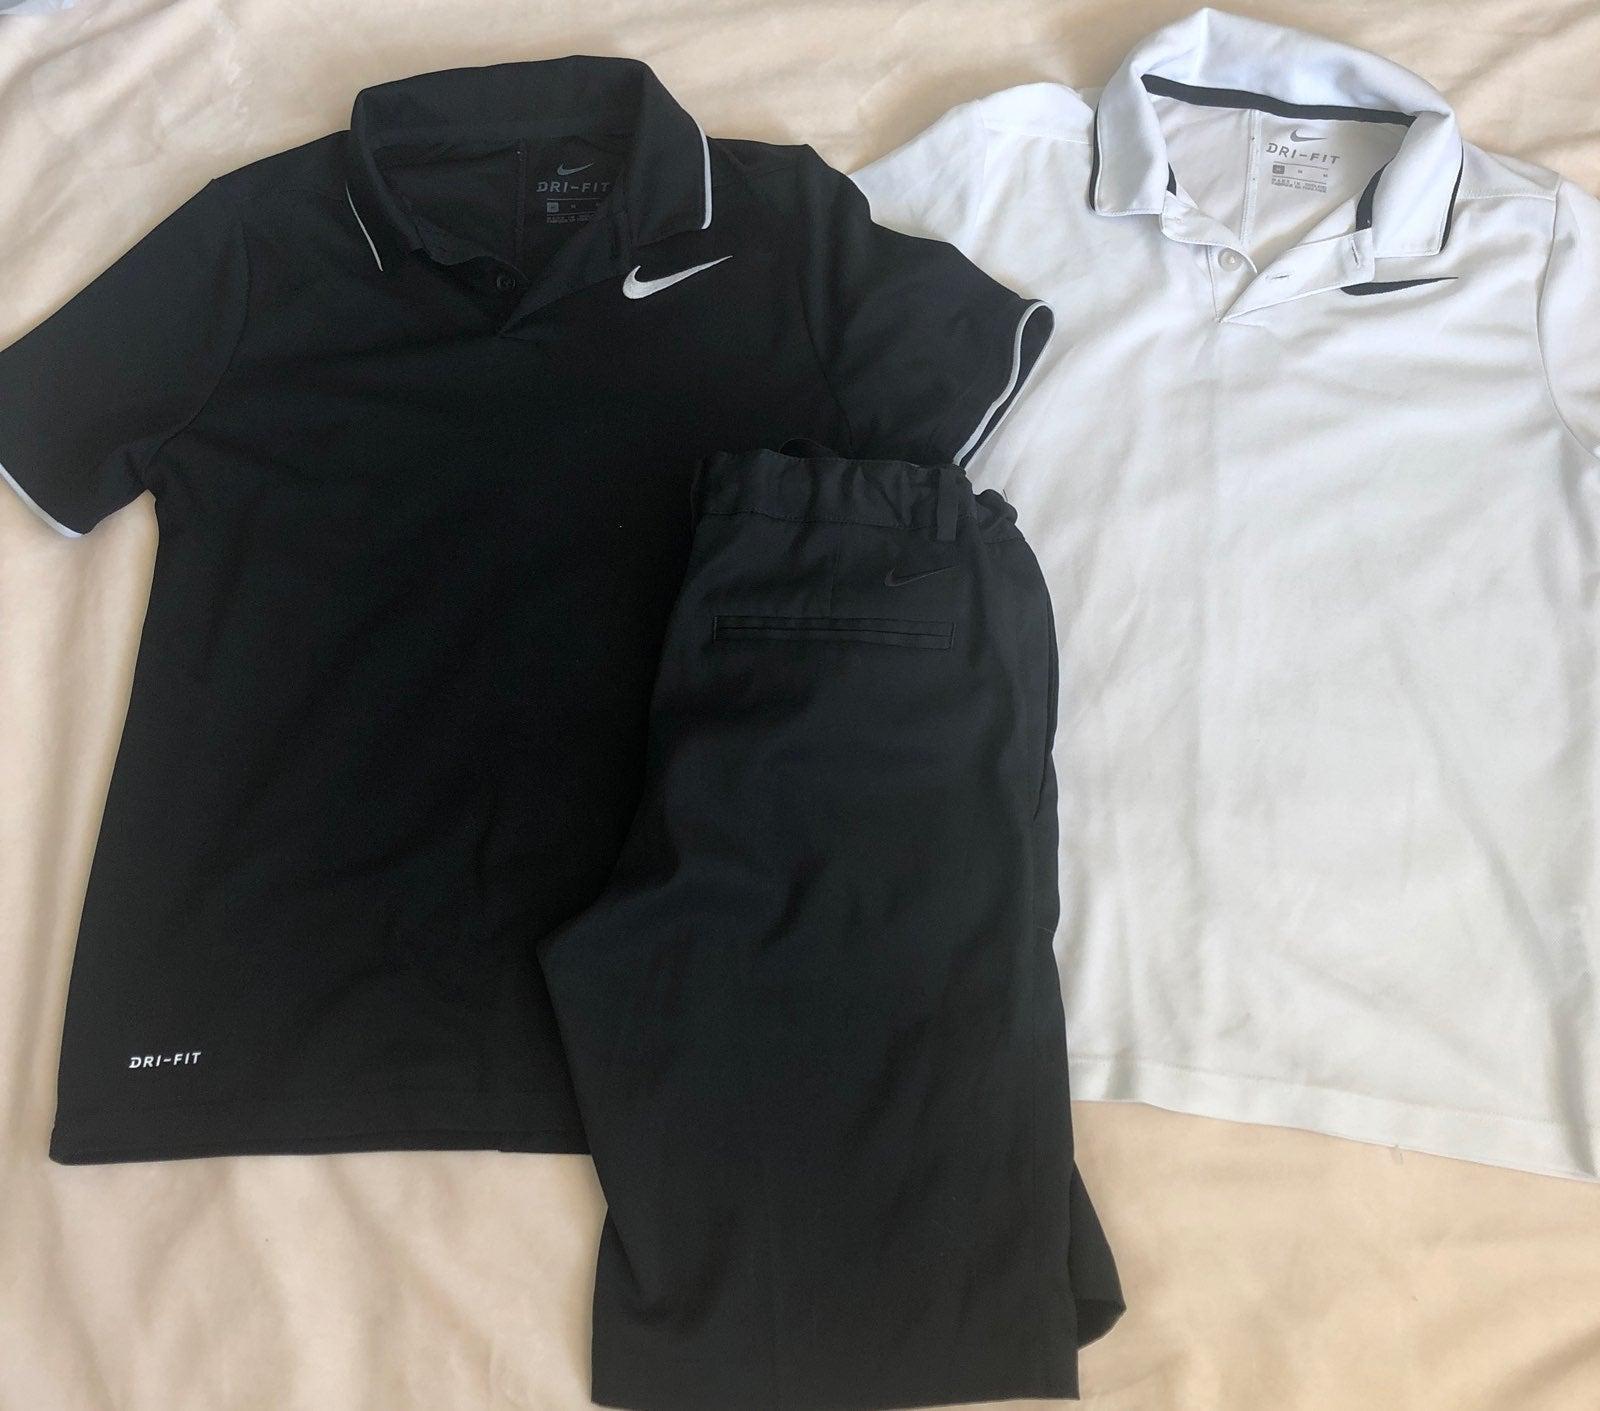 Nike dri fit shirt and shorts size M